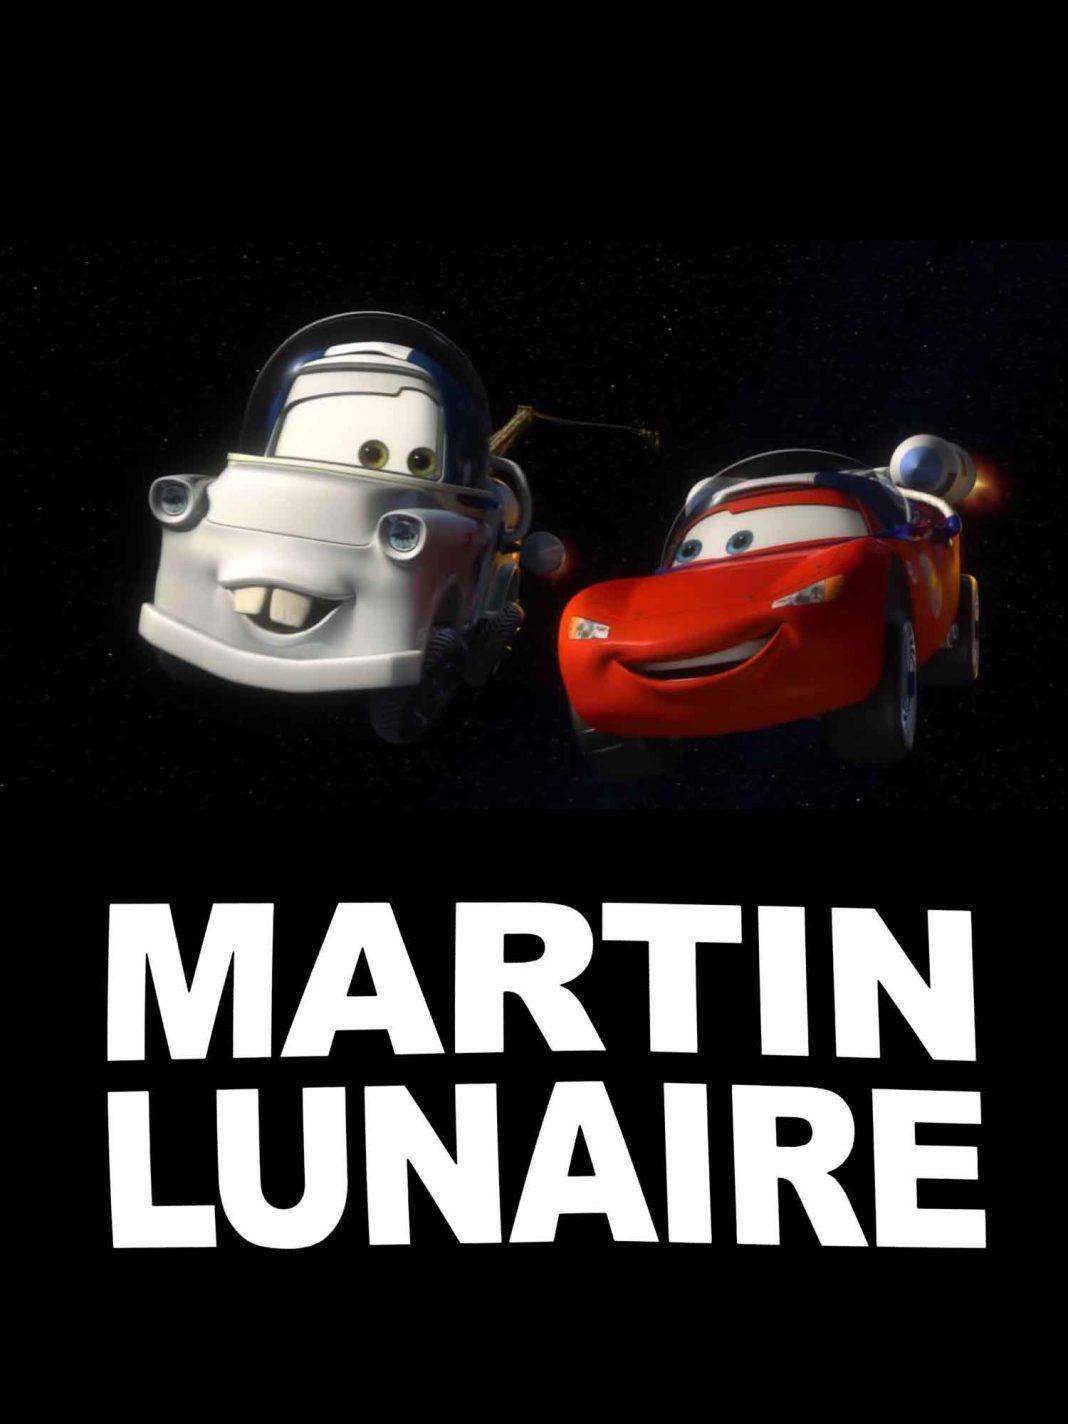 Pixar disney cars toon martin lunaire moon mater affiche poster